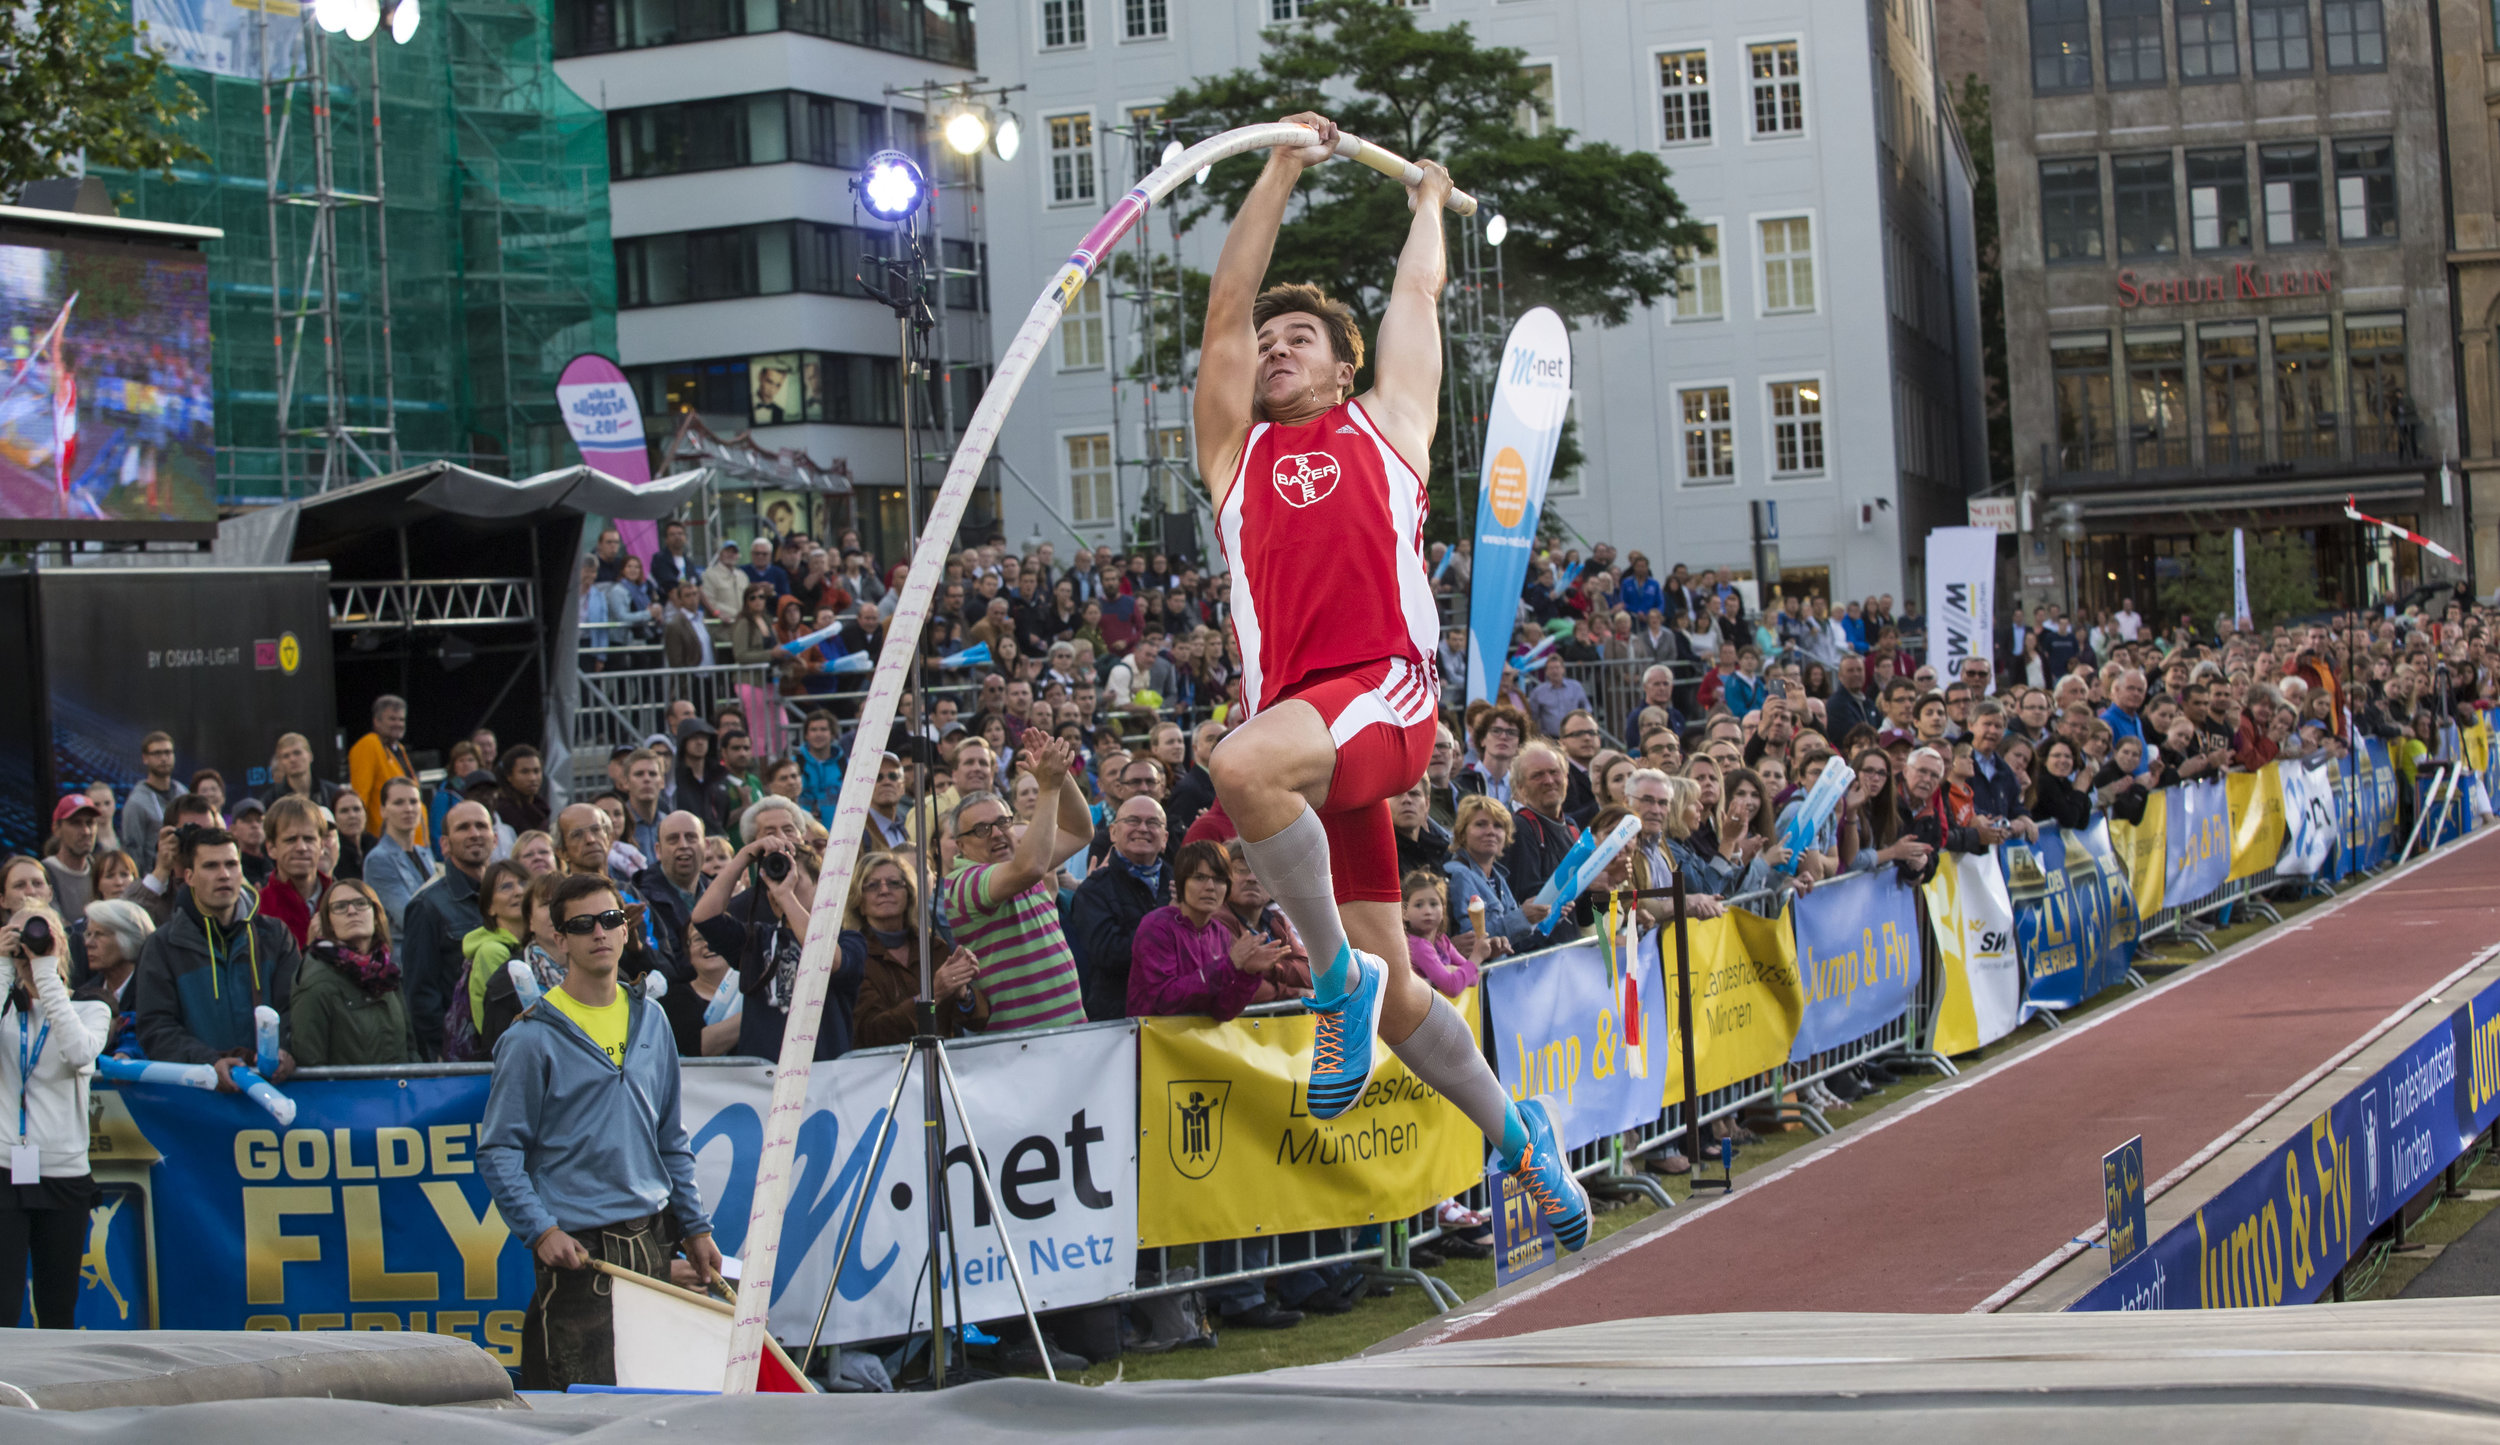 Jump_and_Fly_Munich_Konrad_by_Marcus_Buck.jpg